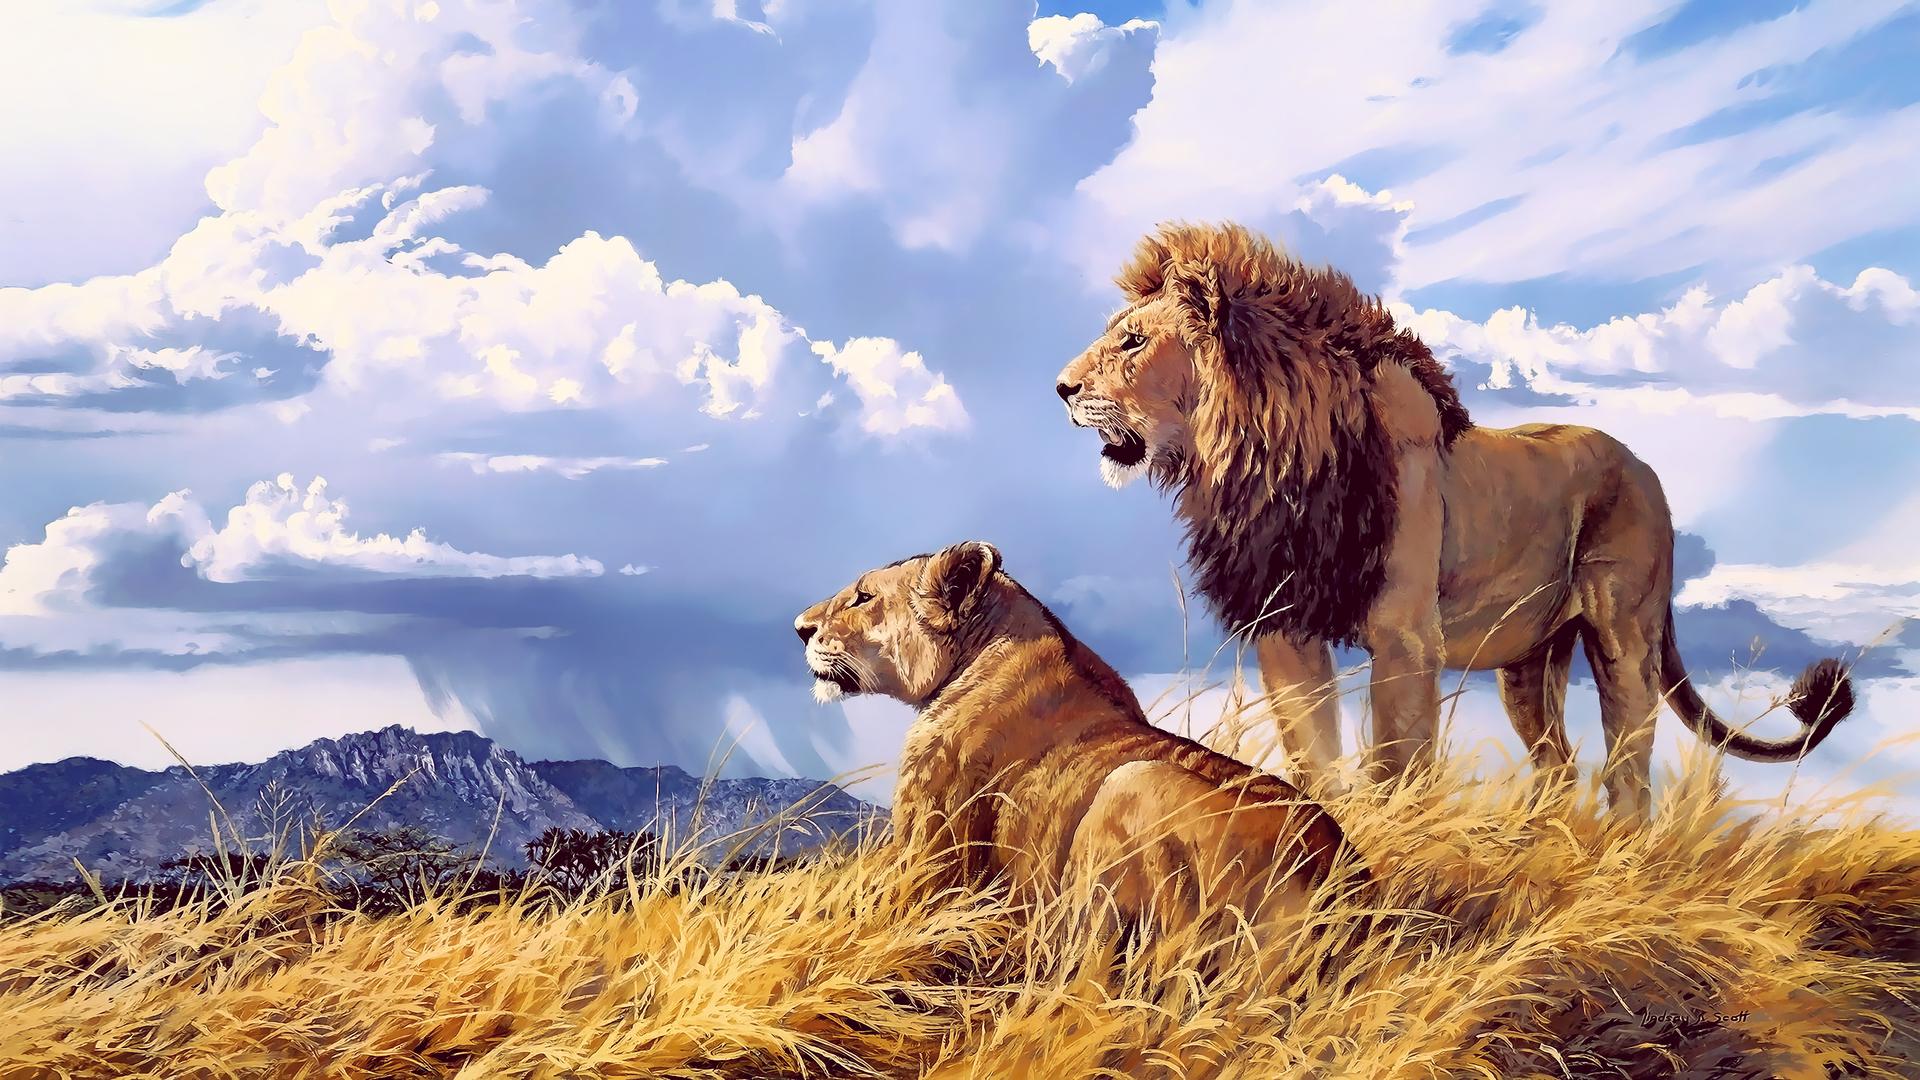 1920x1080 Lion Lioness Artwork 4k Laptop Full HD 1080P HD ...